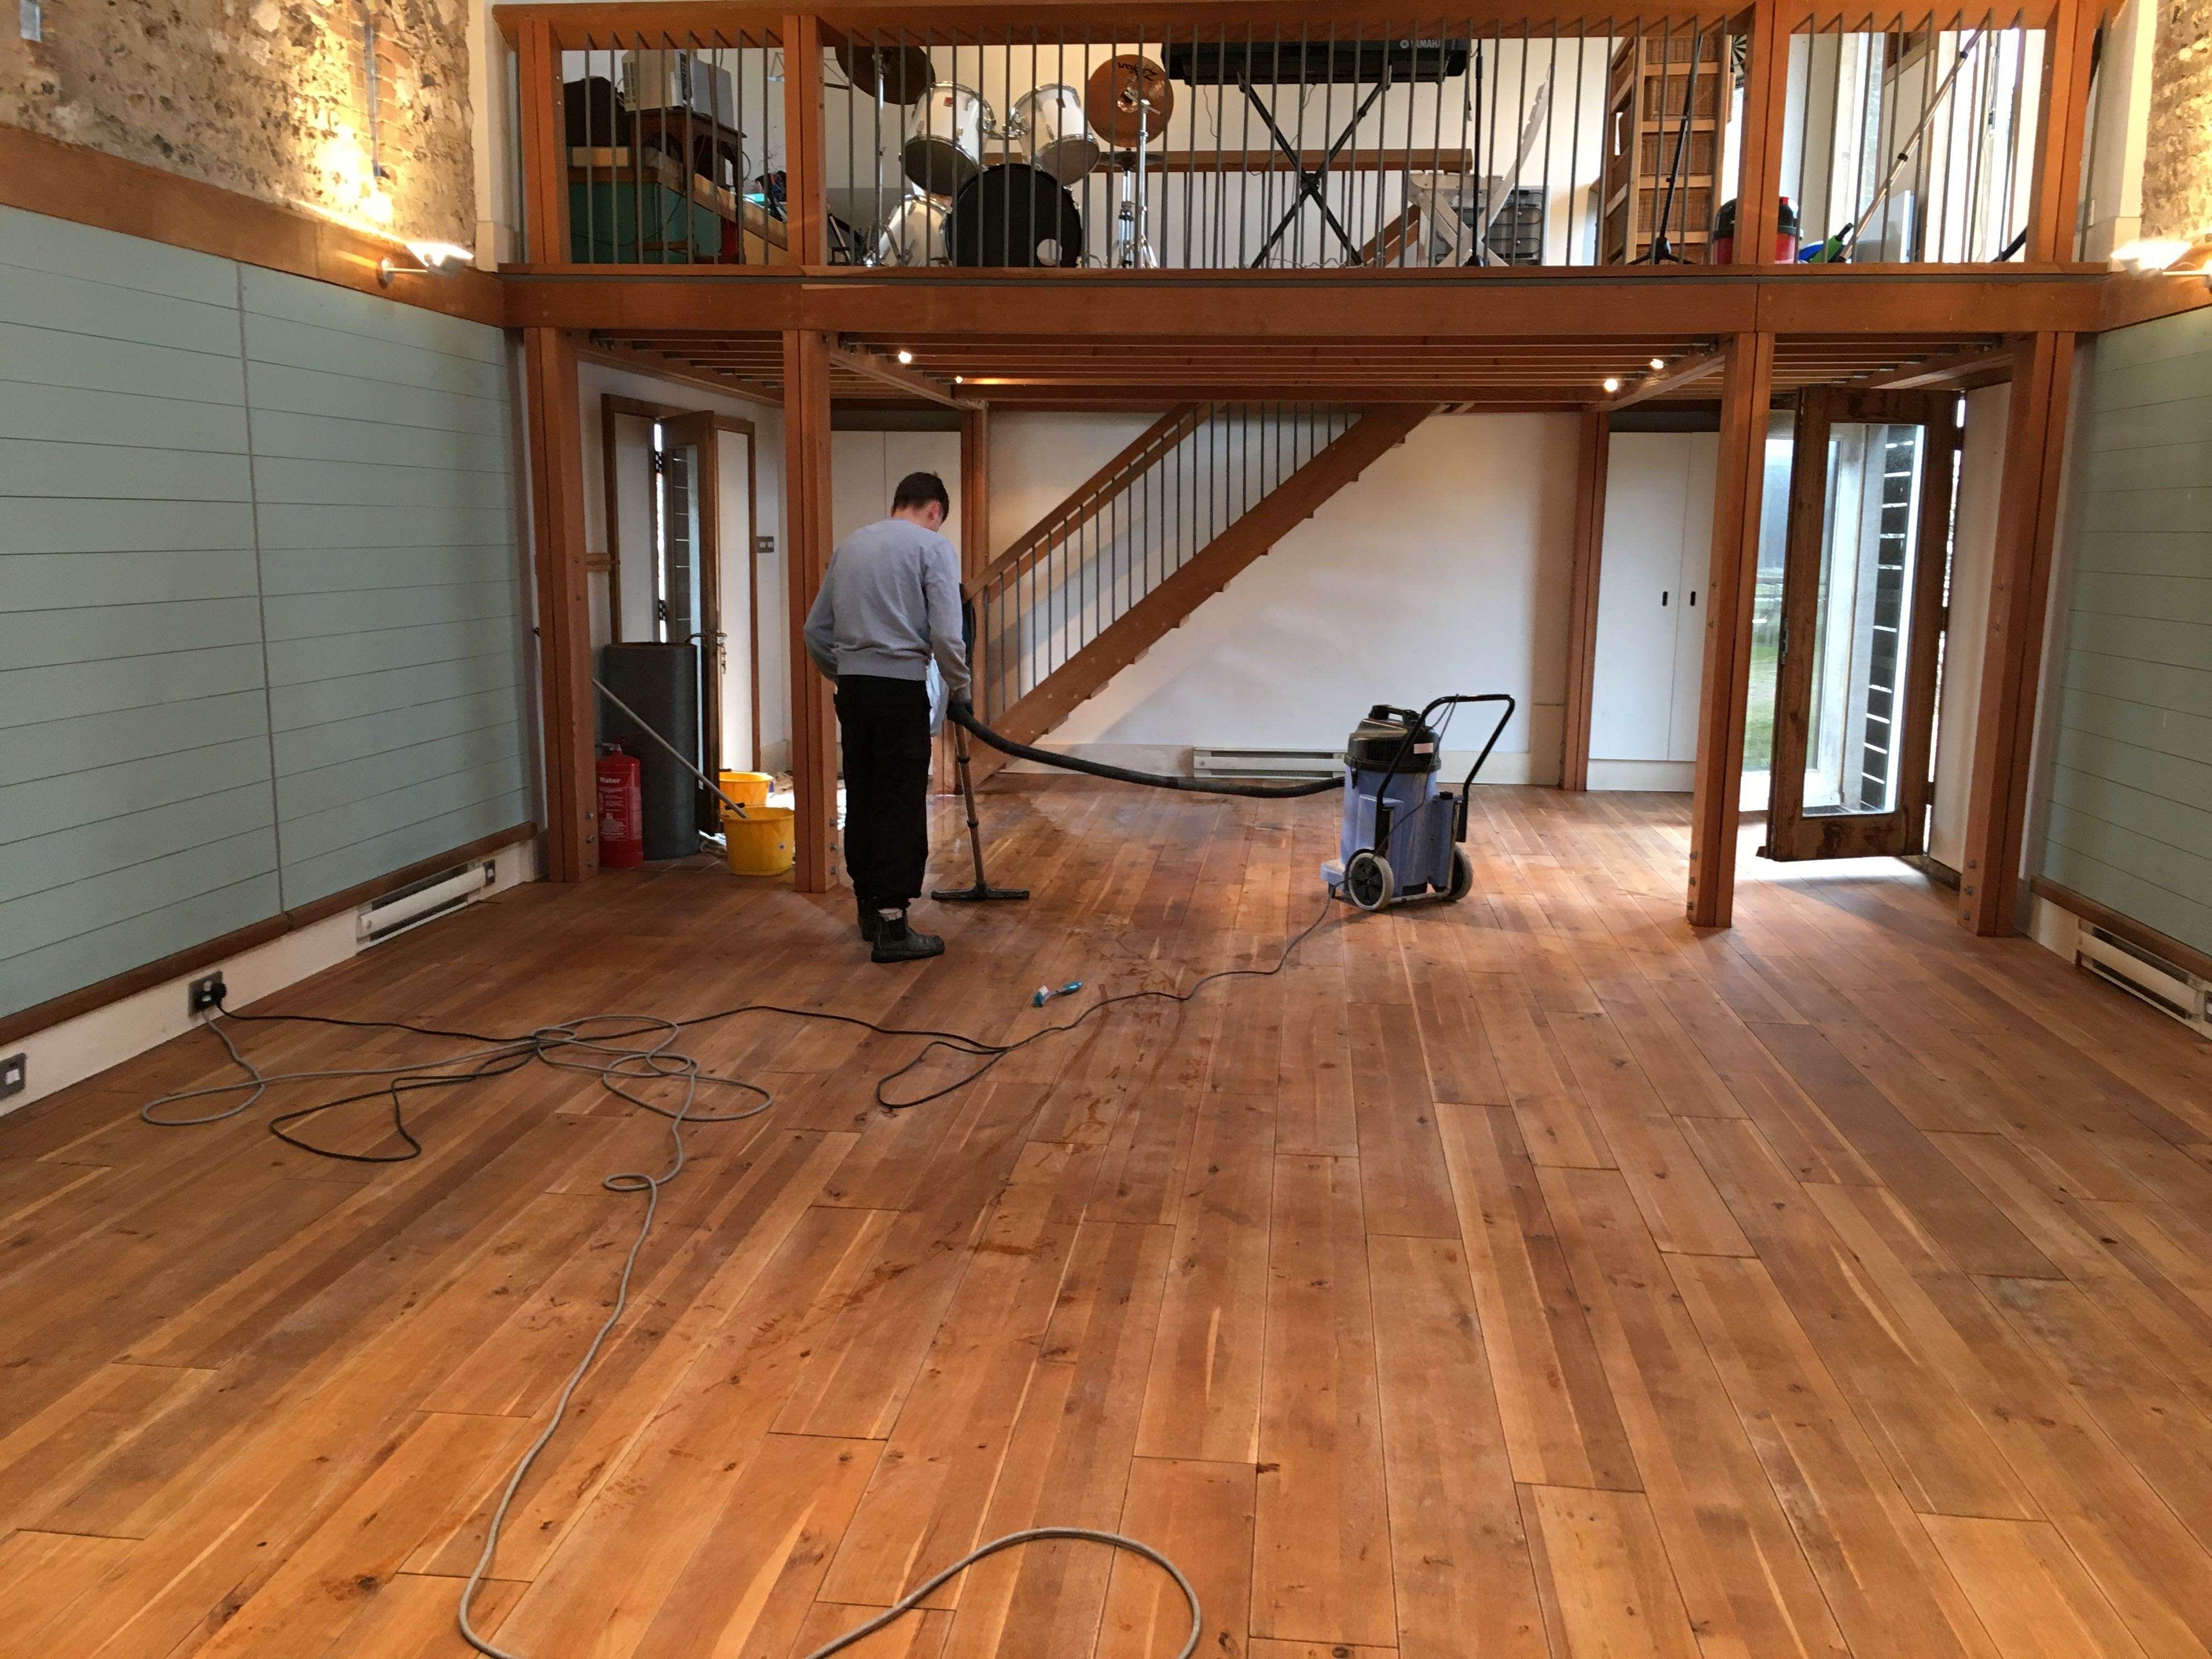 india flooring shaw wood floating ca formidable cost hardwood plank ideas kitchen cleaner bona comparison laminate floors installation oak vs in engineered floor wide